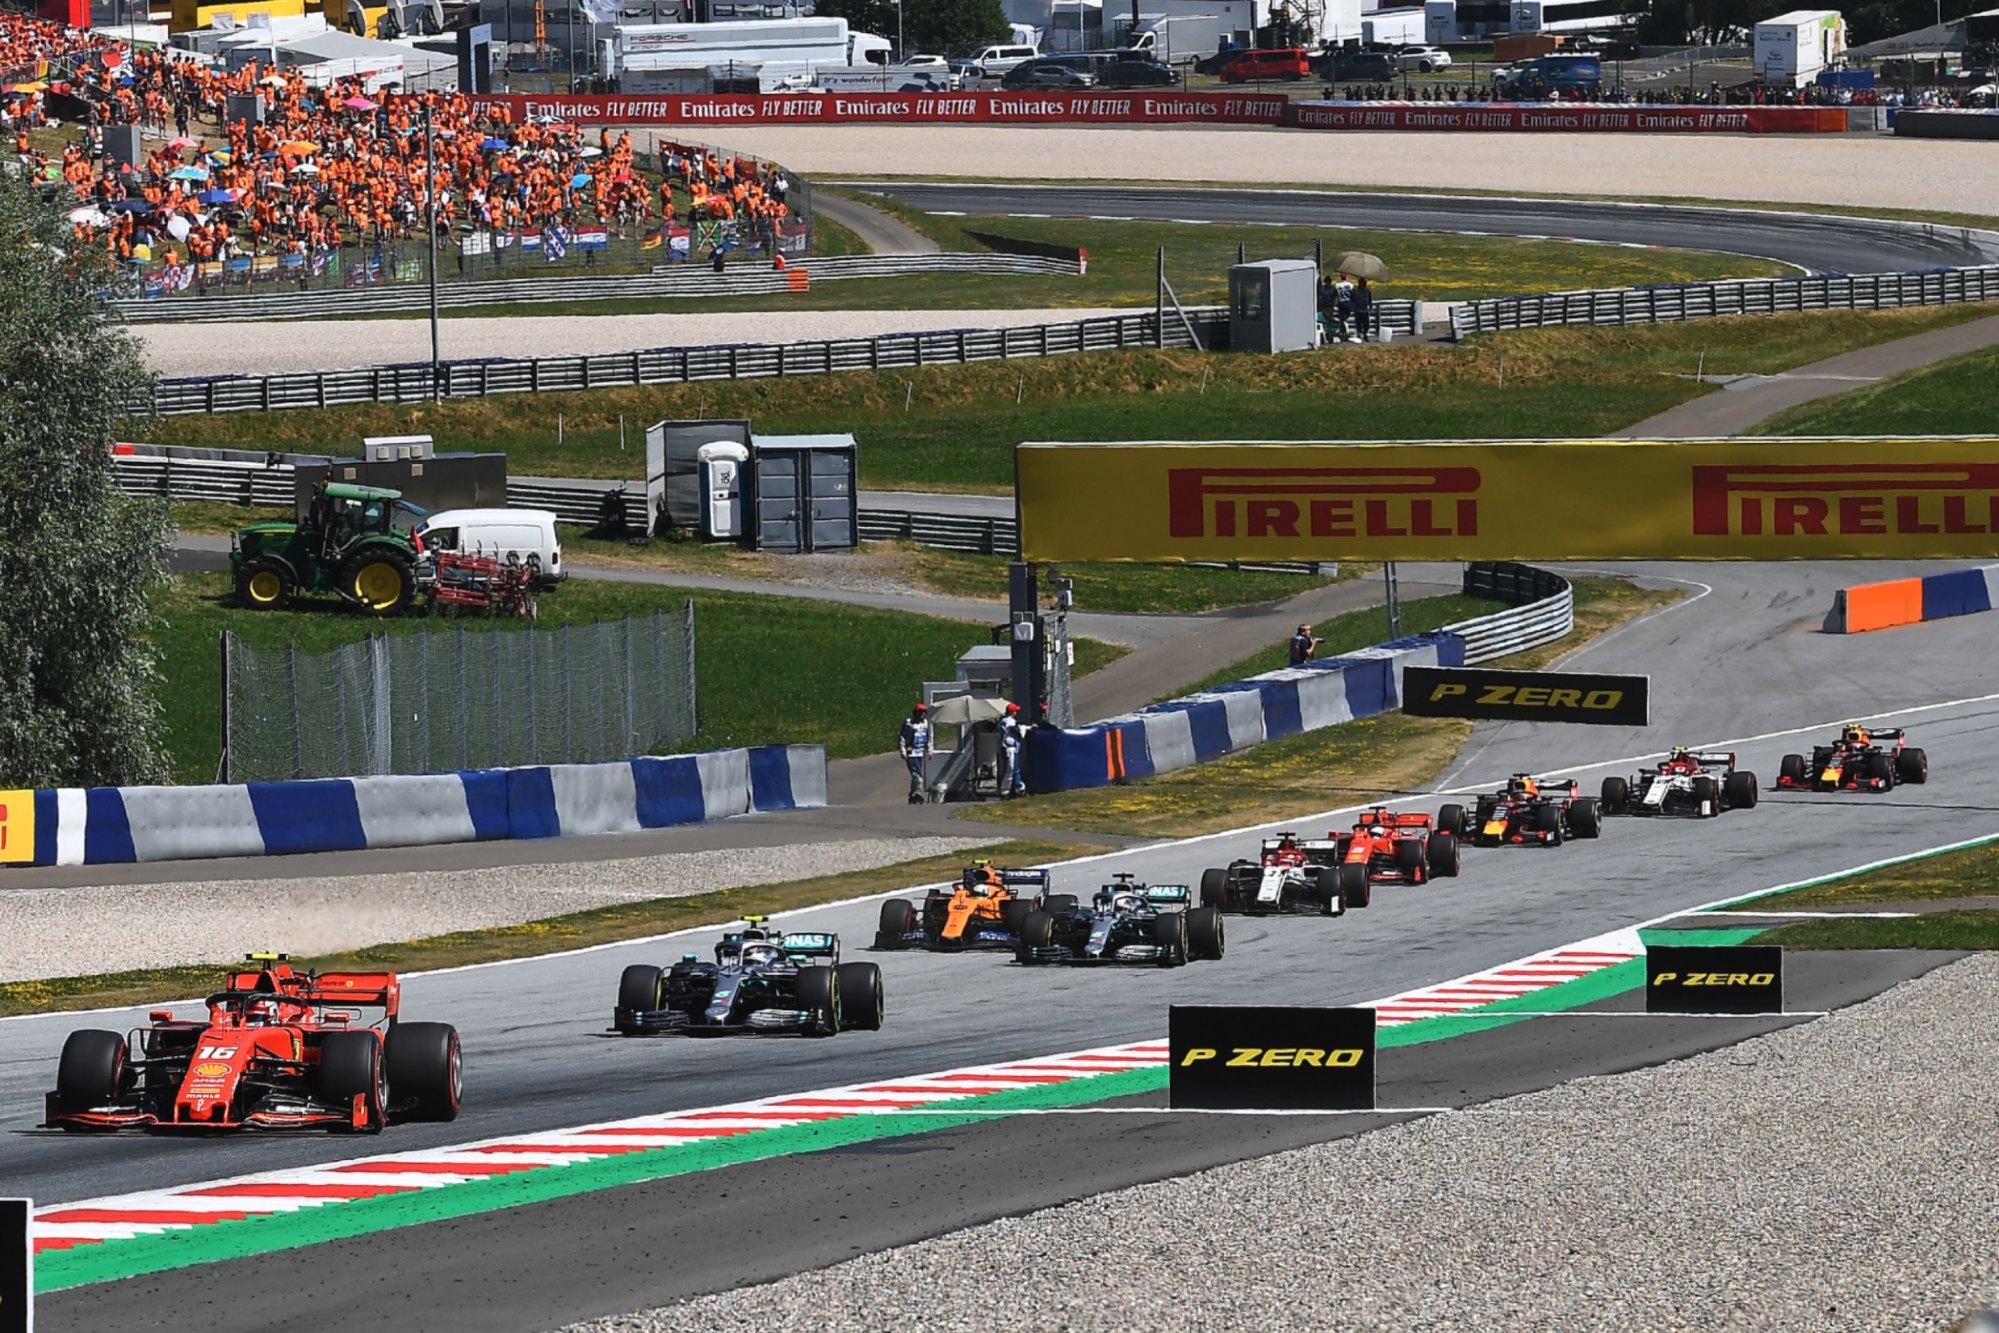 2019 Austrian GP start